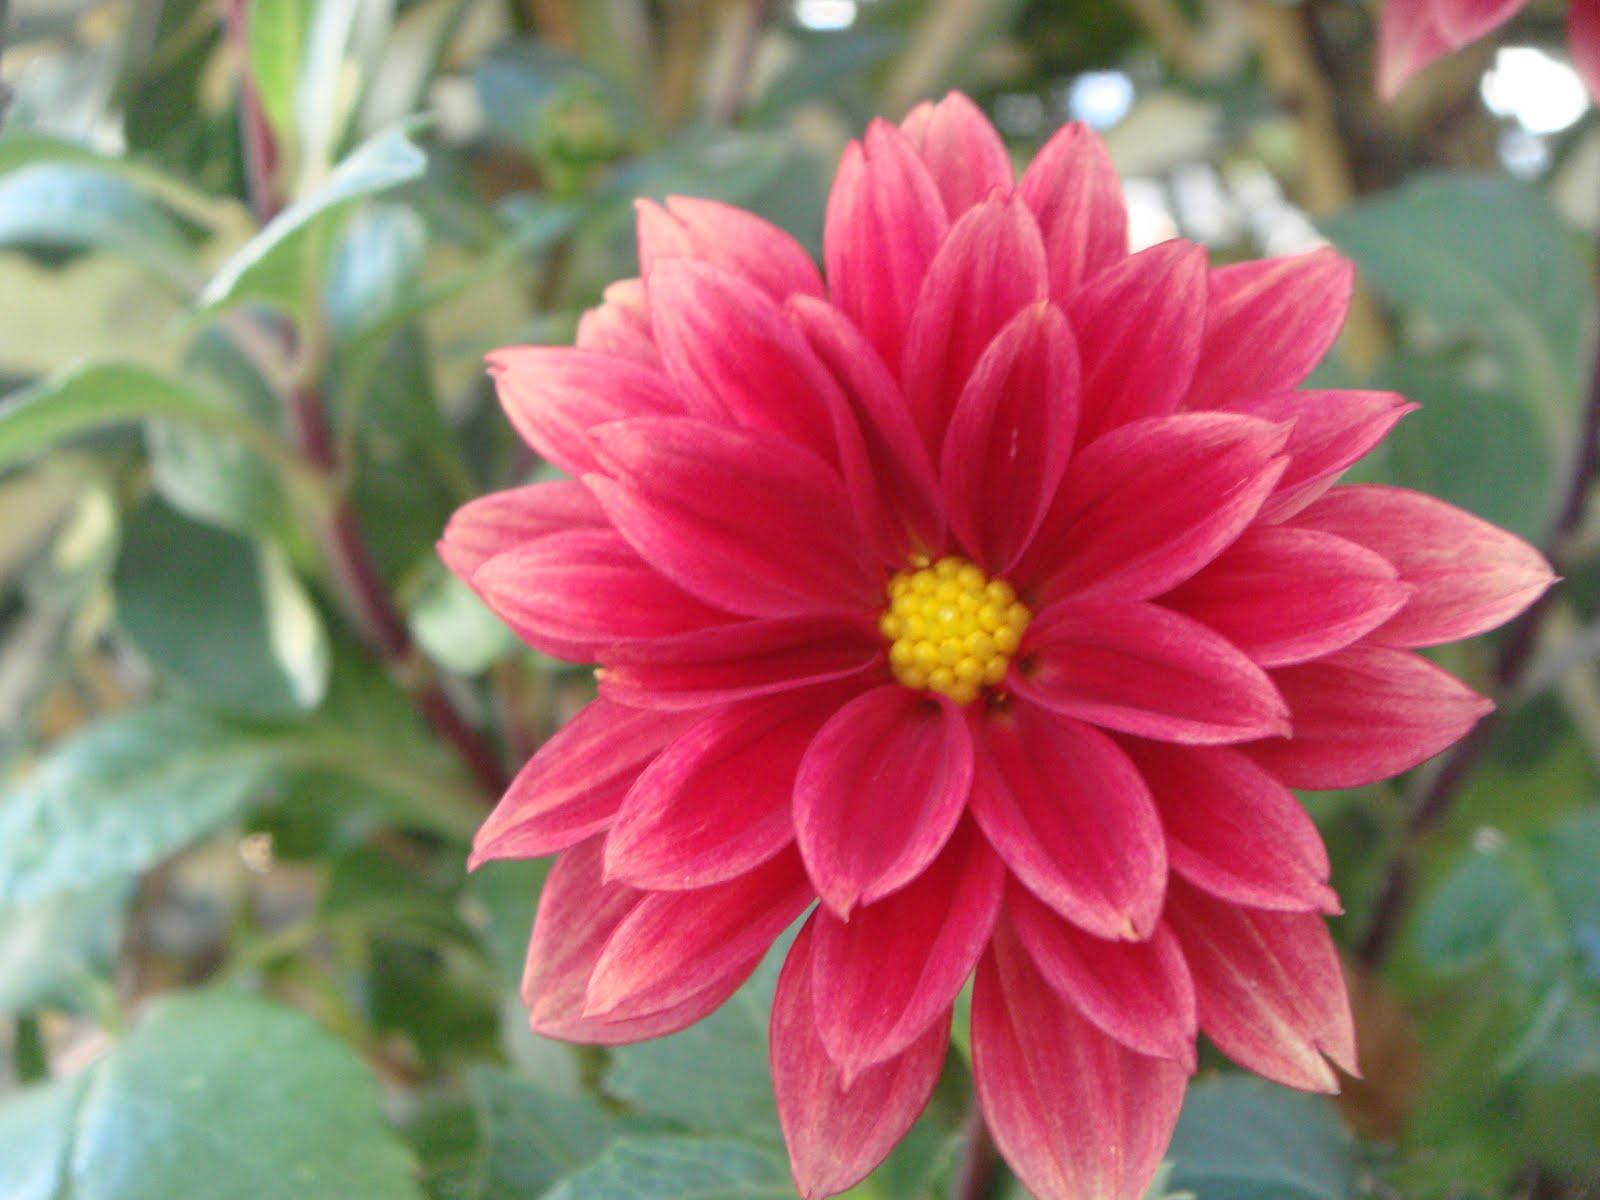 Flores dalia car interior design - Imagenes de plantas de interior ...